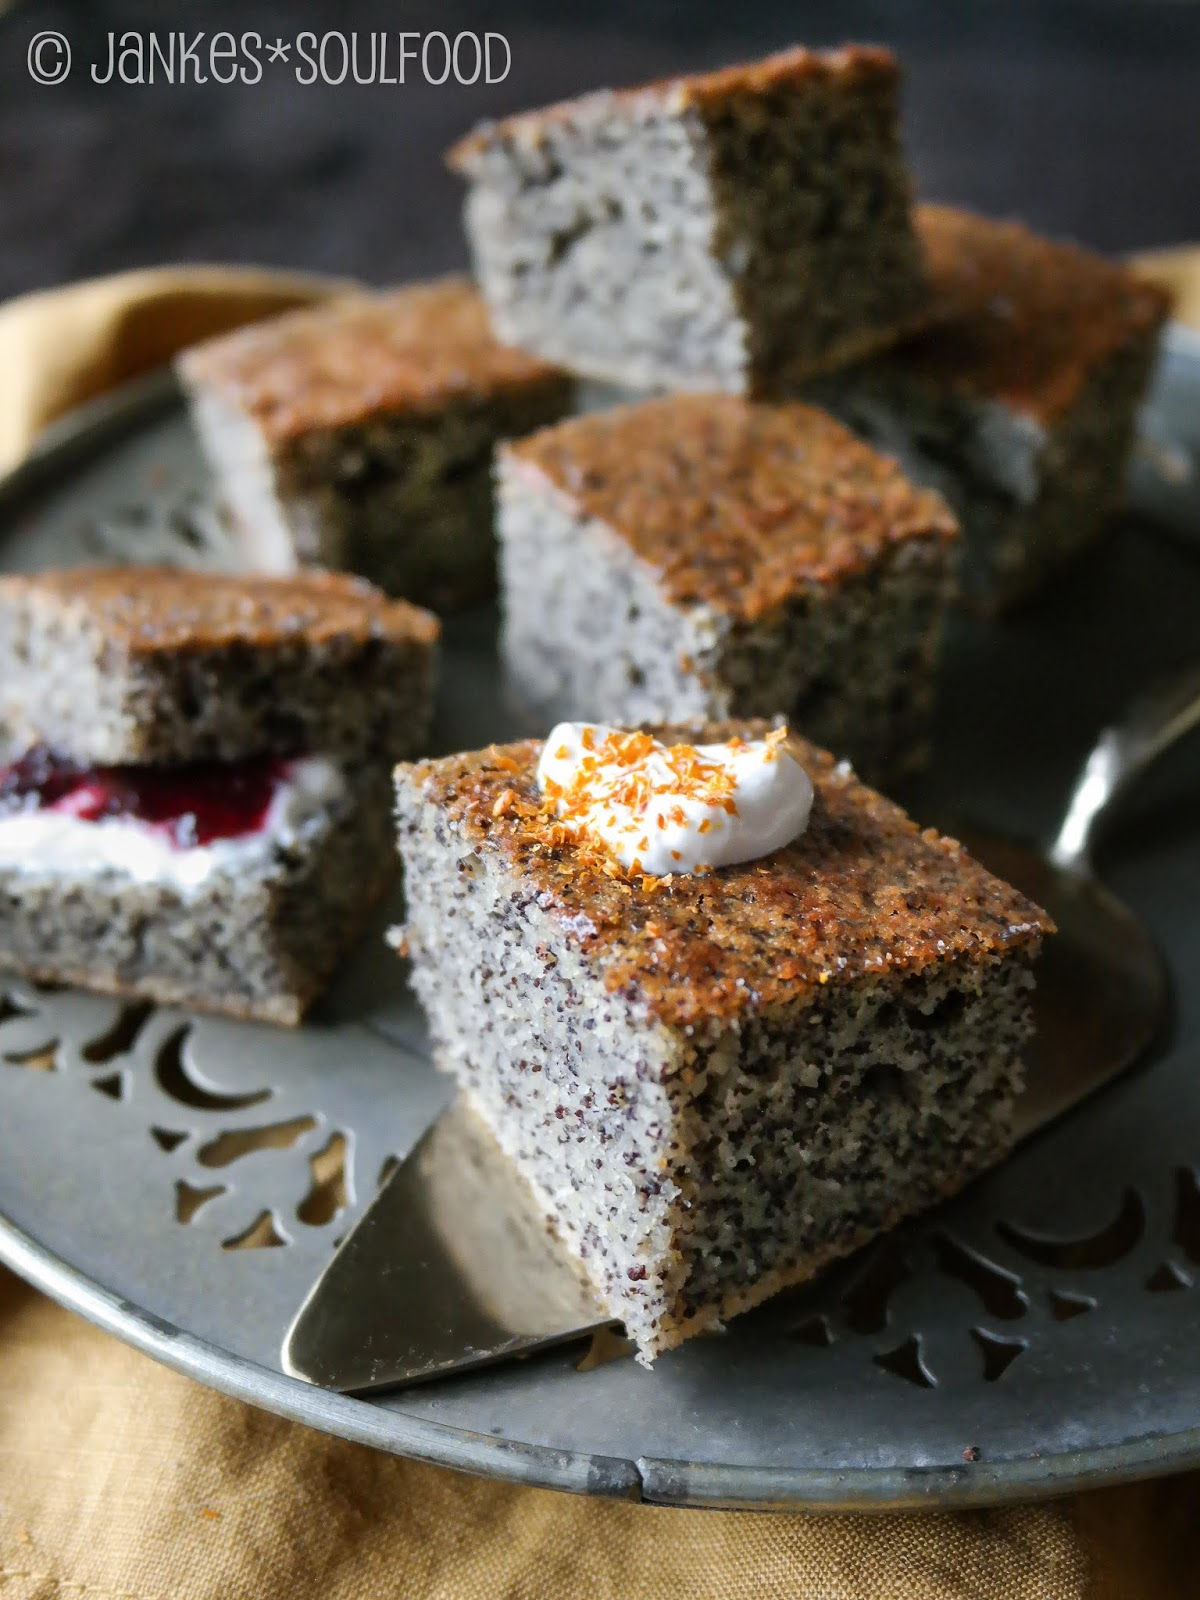 Mohn-Grieß-Kuchen - Jankes*Soulfood